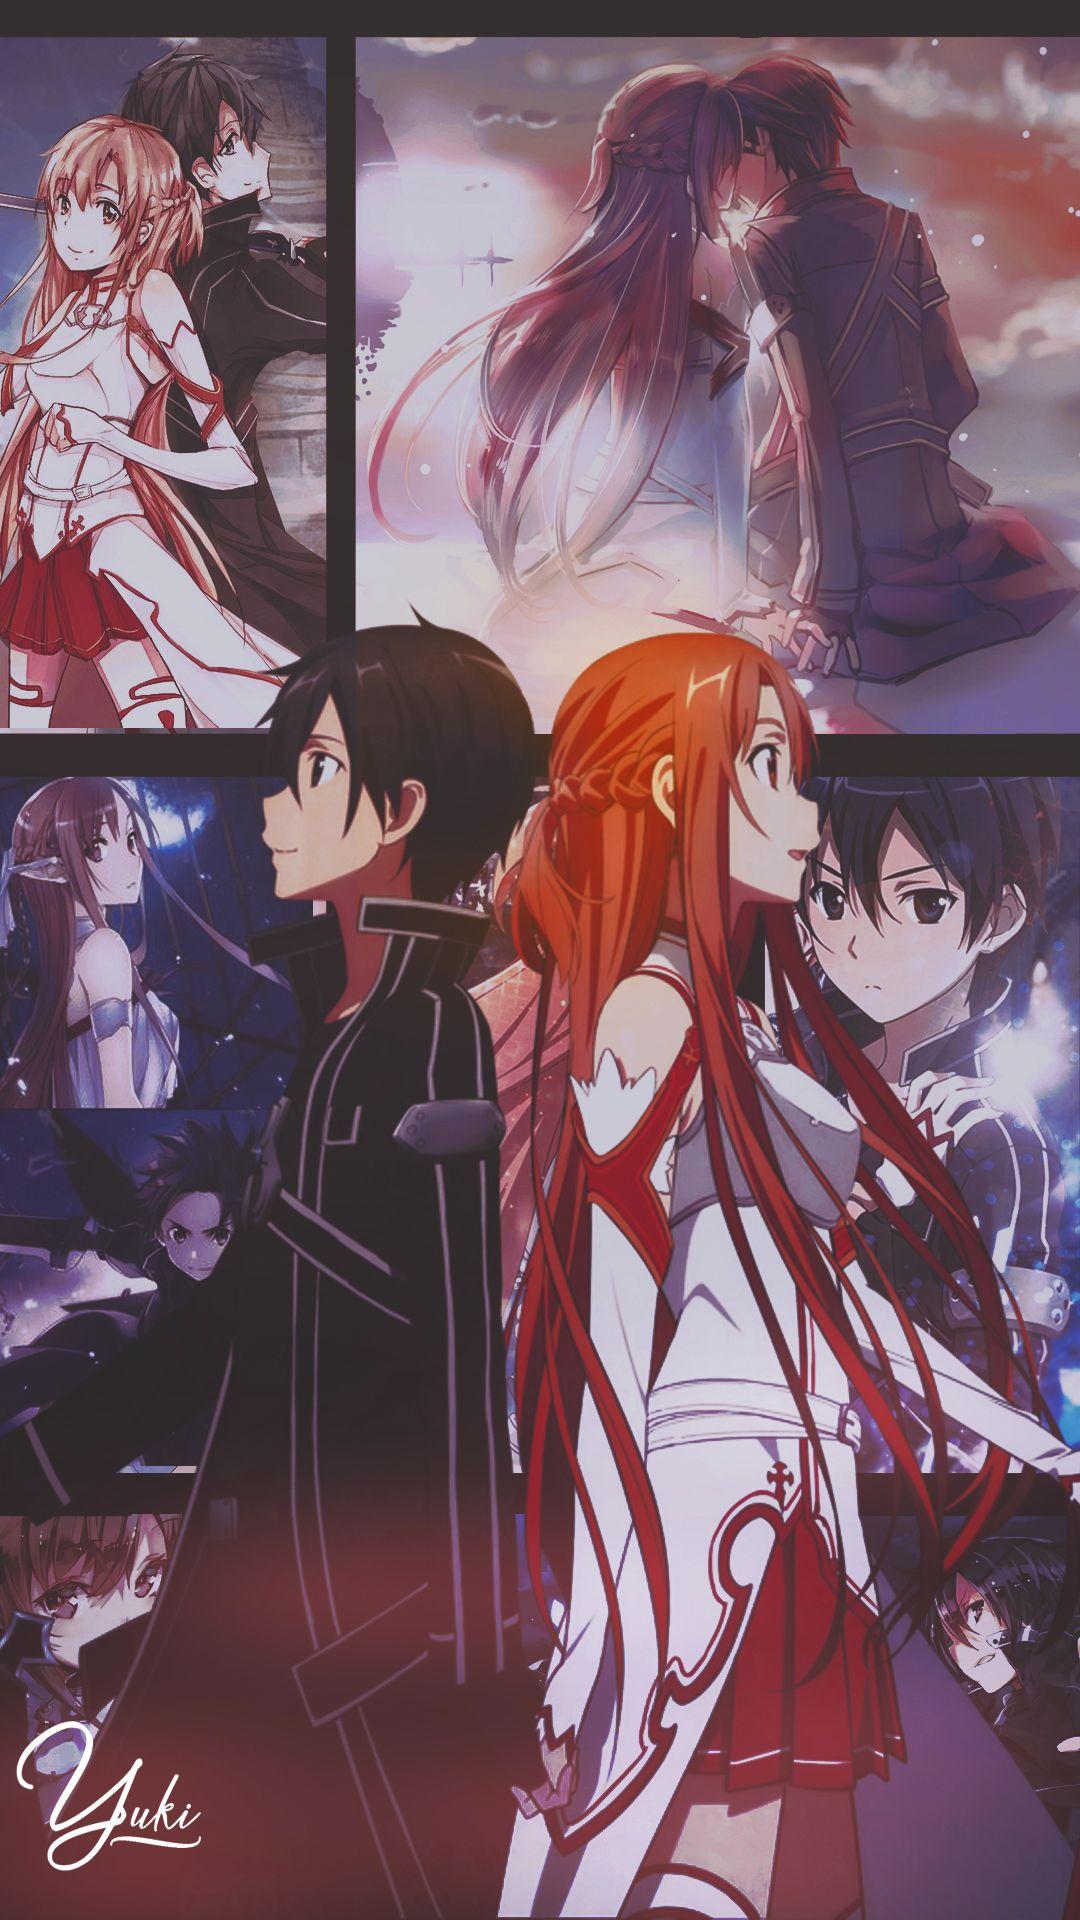 Pin De Fidelisadityawan Em Alucard Personagens De Anime Animes Wallpapers Casal Anime